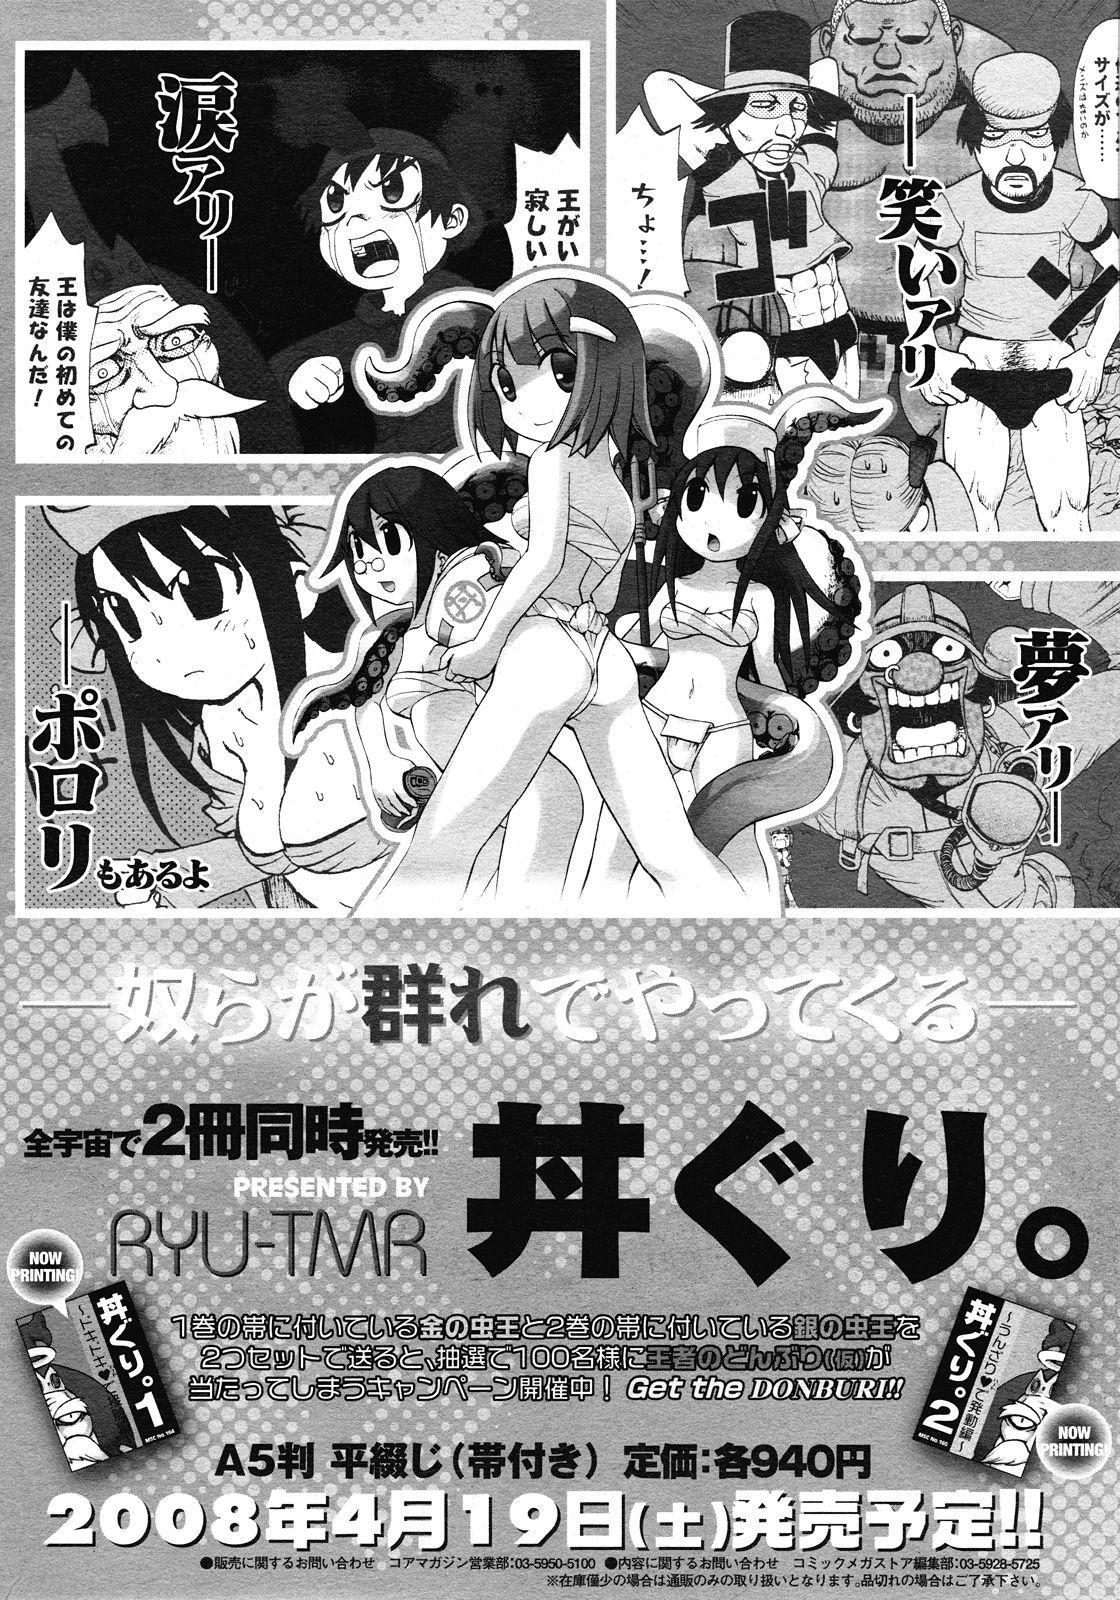 COMIC Megastore 2008-05 145